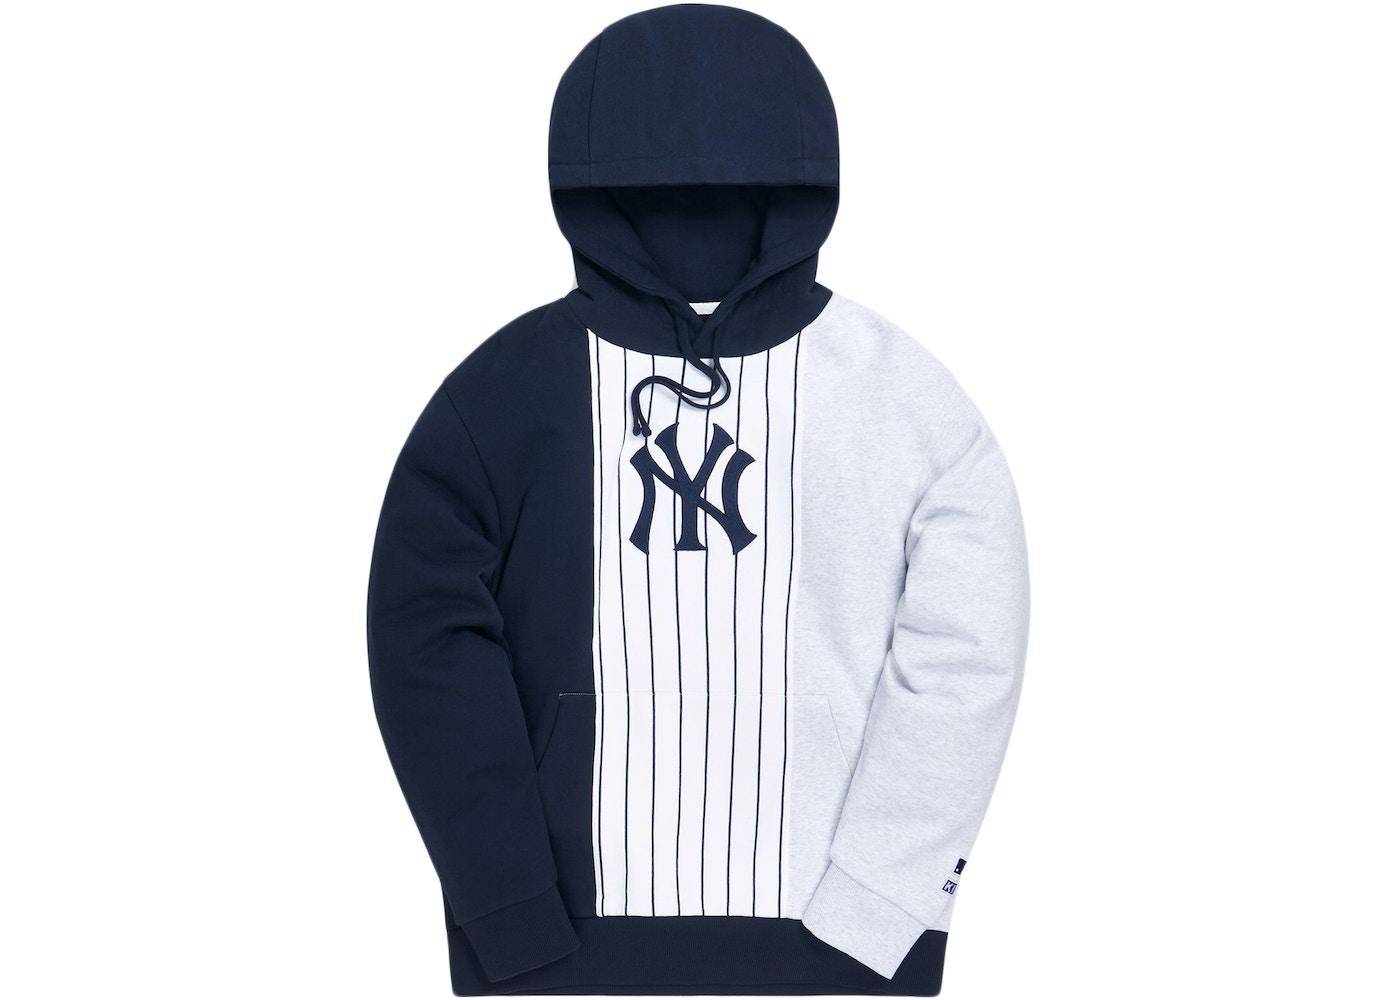 Kith For Major League Baseball New York Yankees Home Run Hoodie Multi Fw20